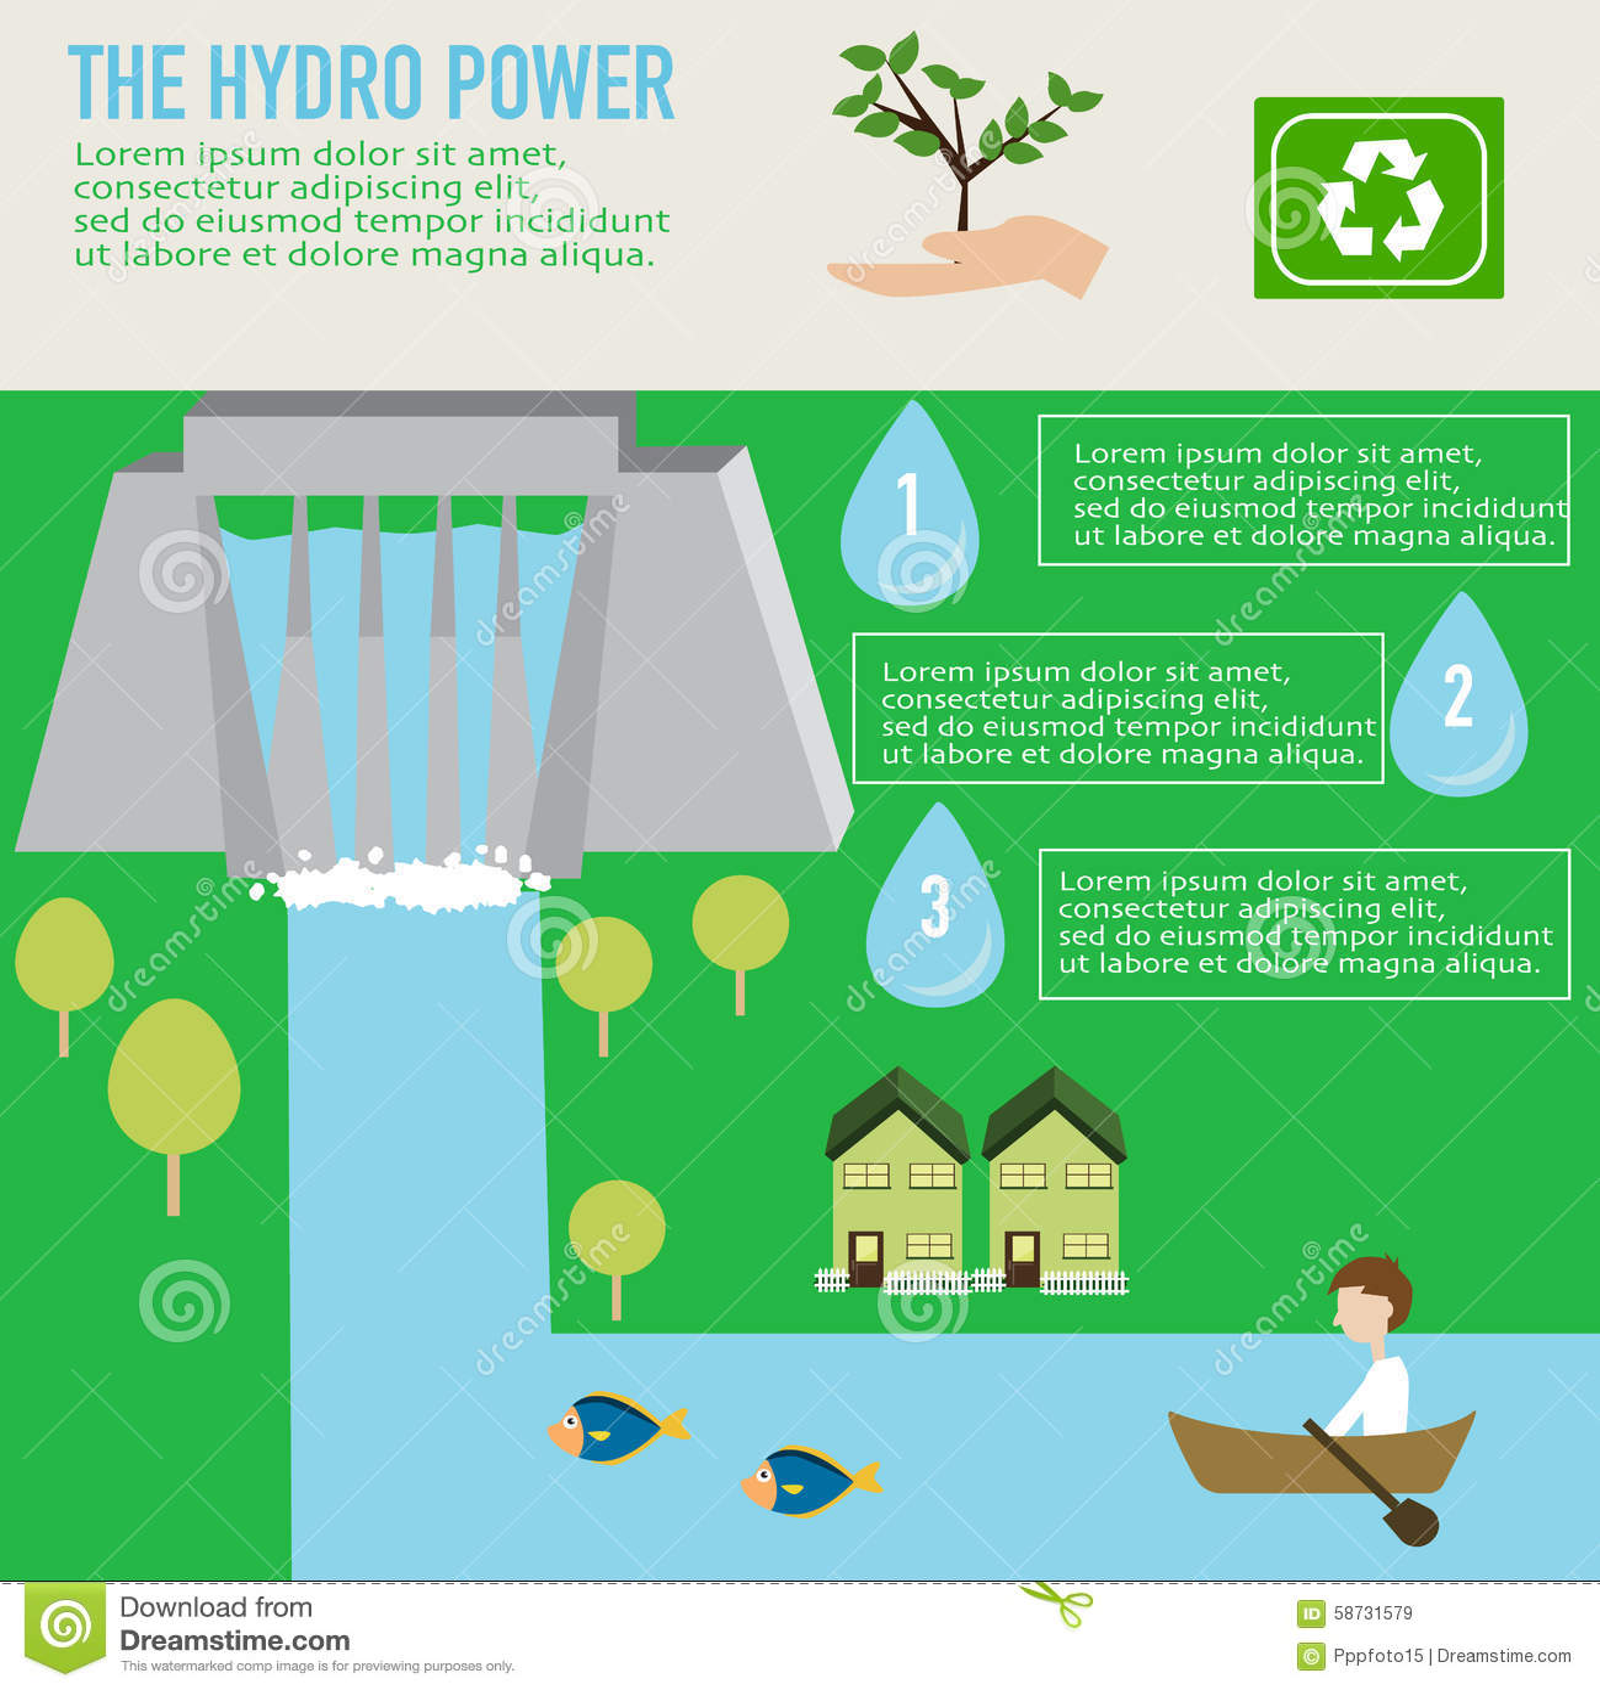 hydro power plant business plan